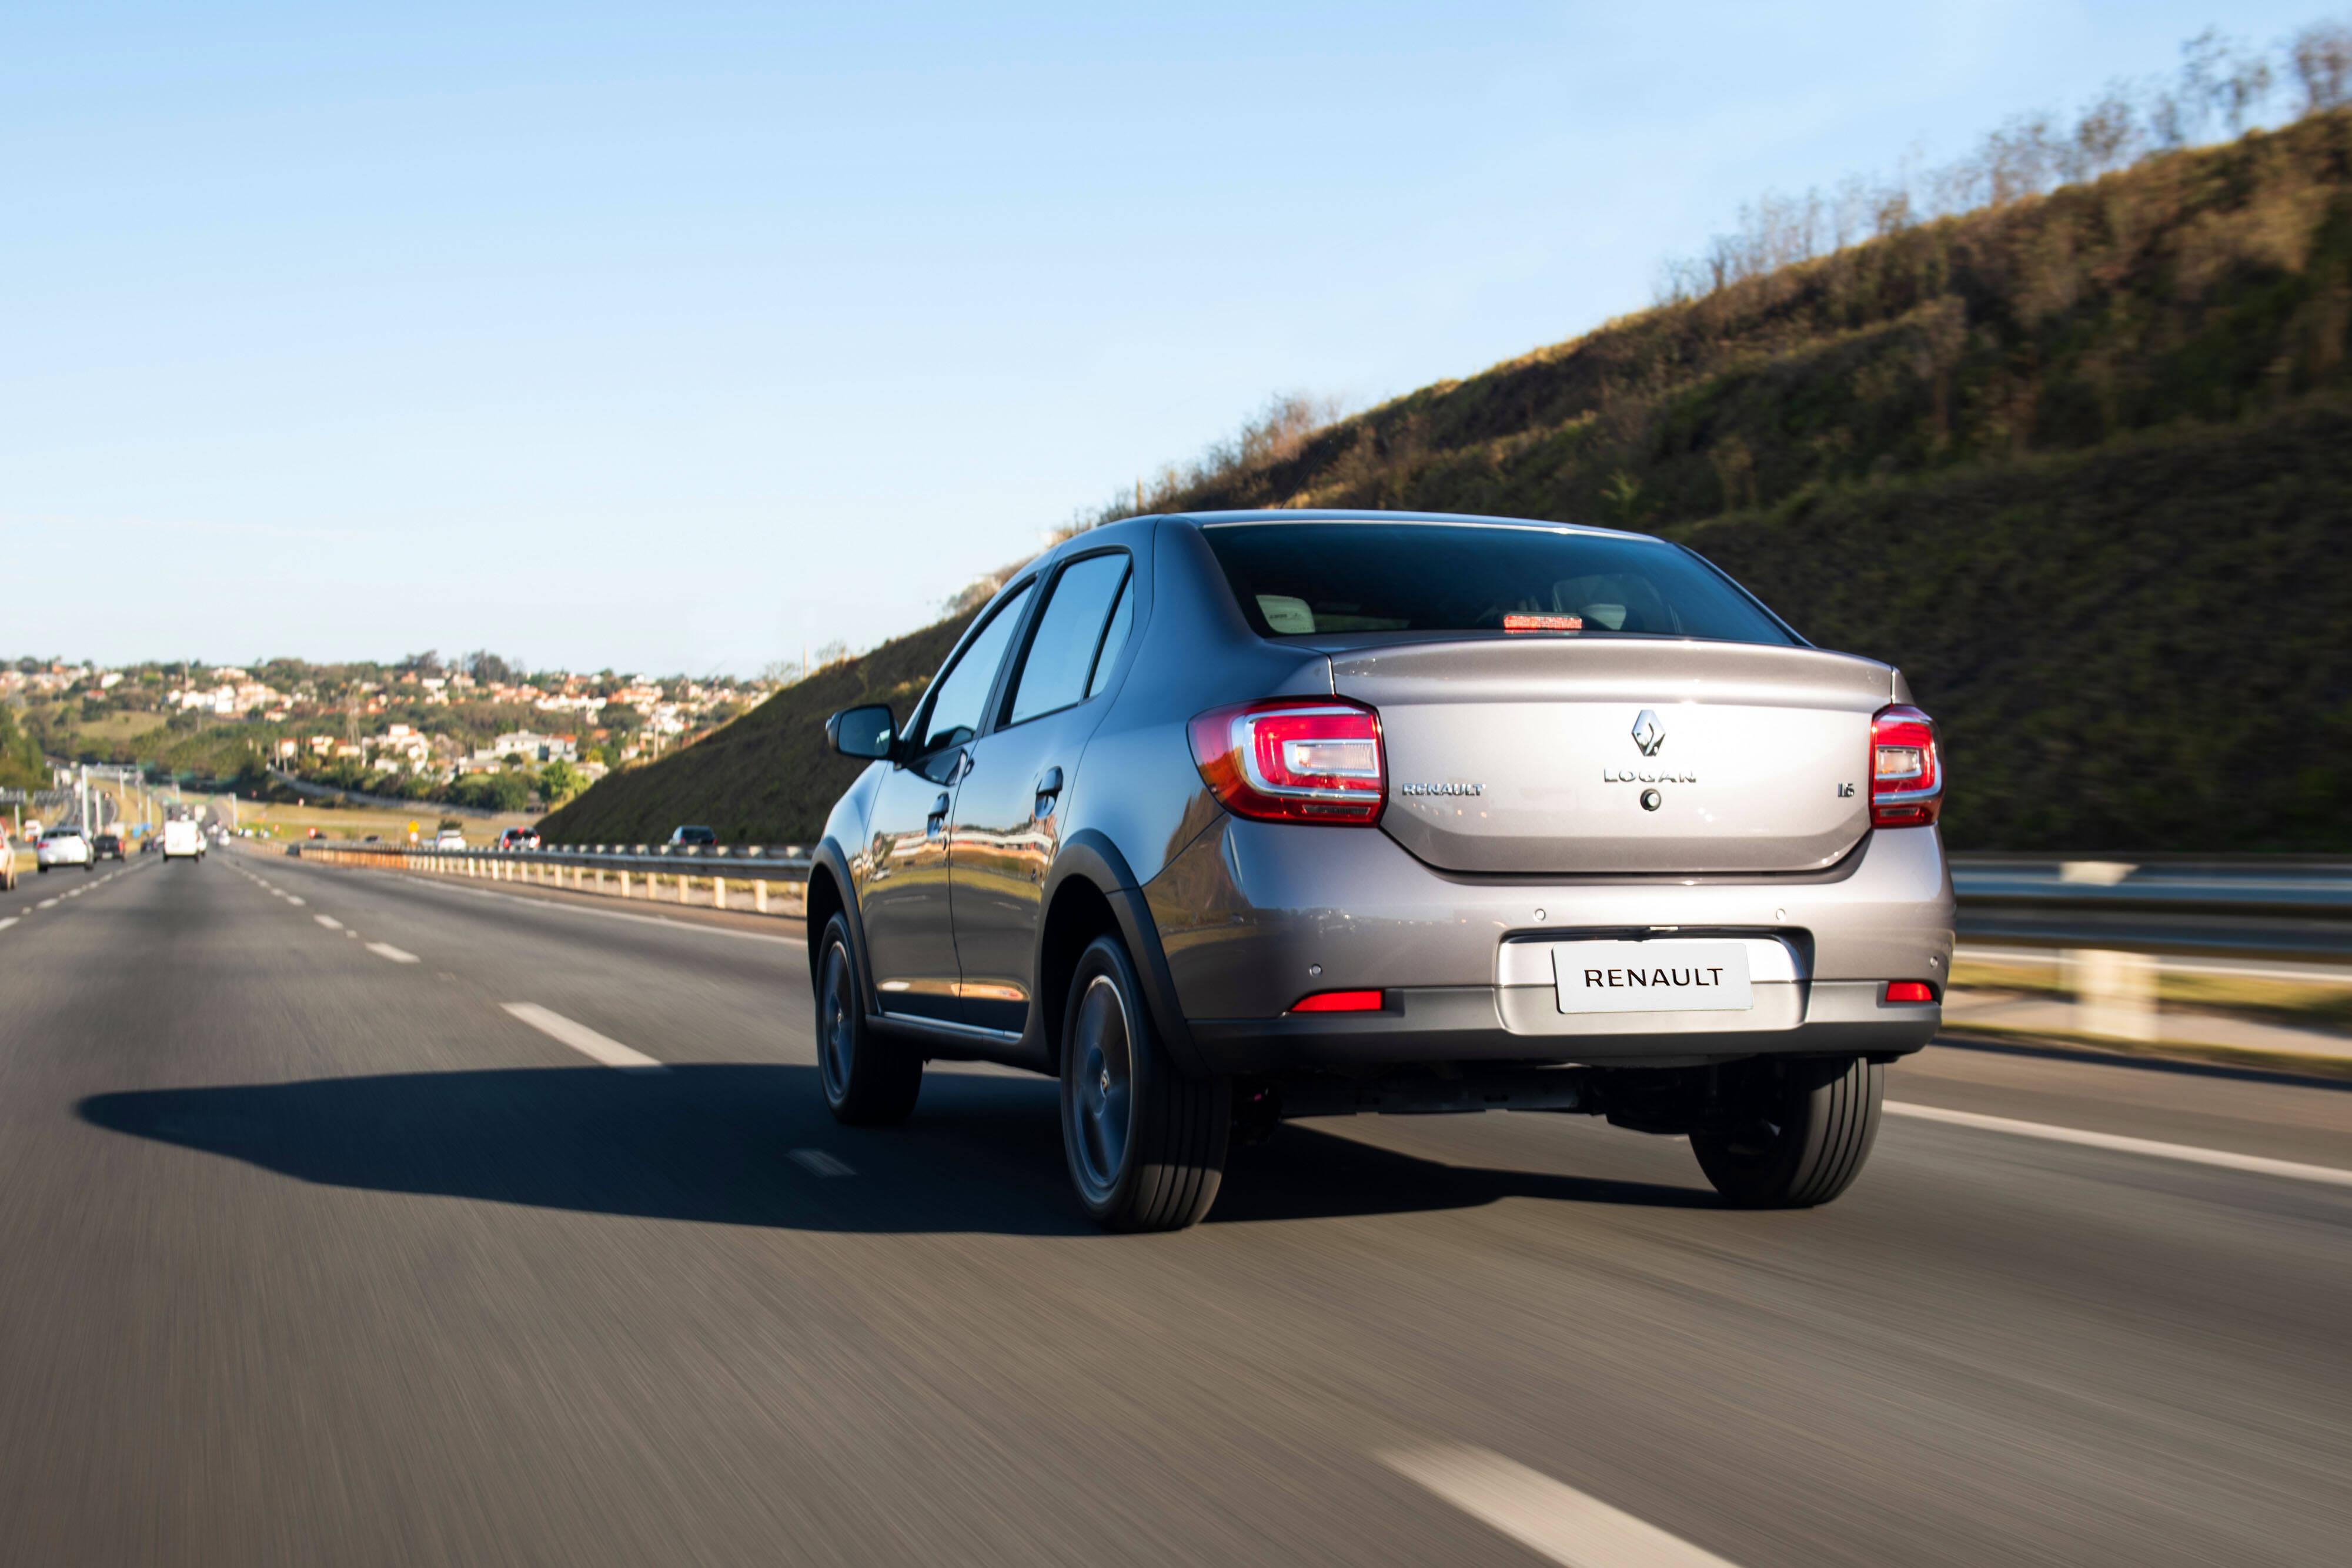 Renault Logan 2020. Foto: Divulgação